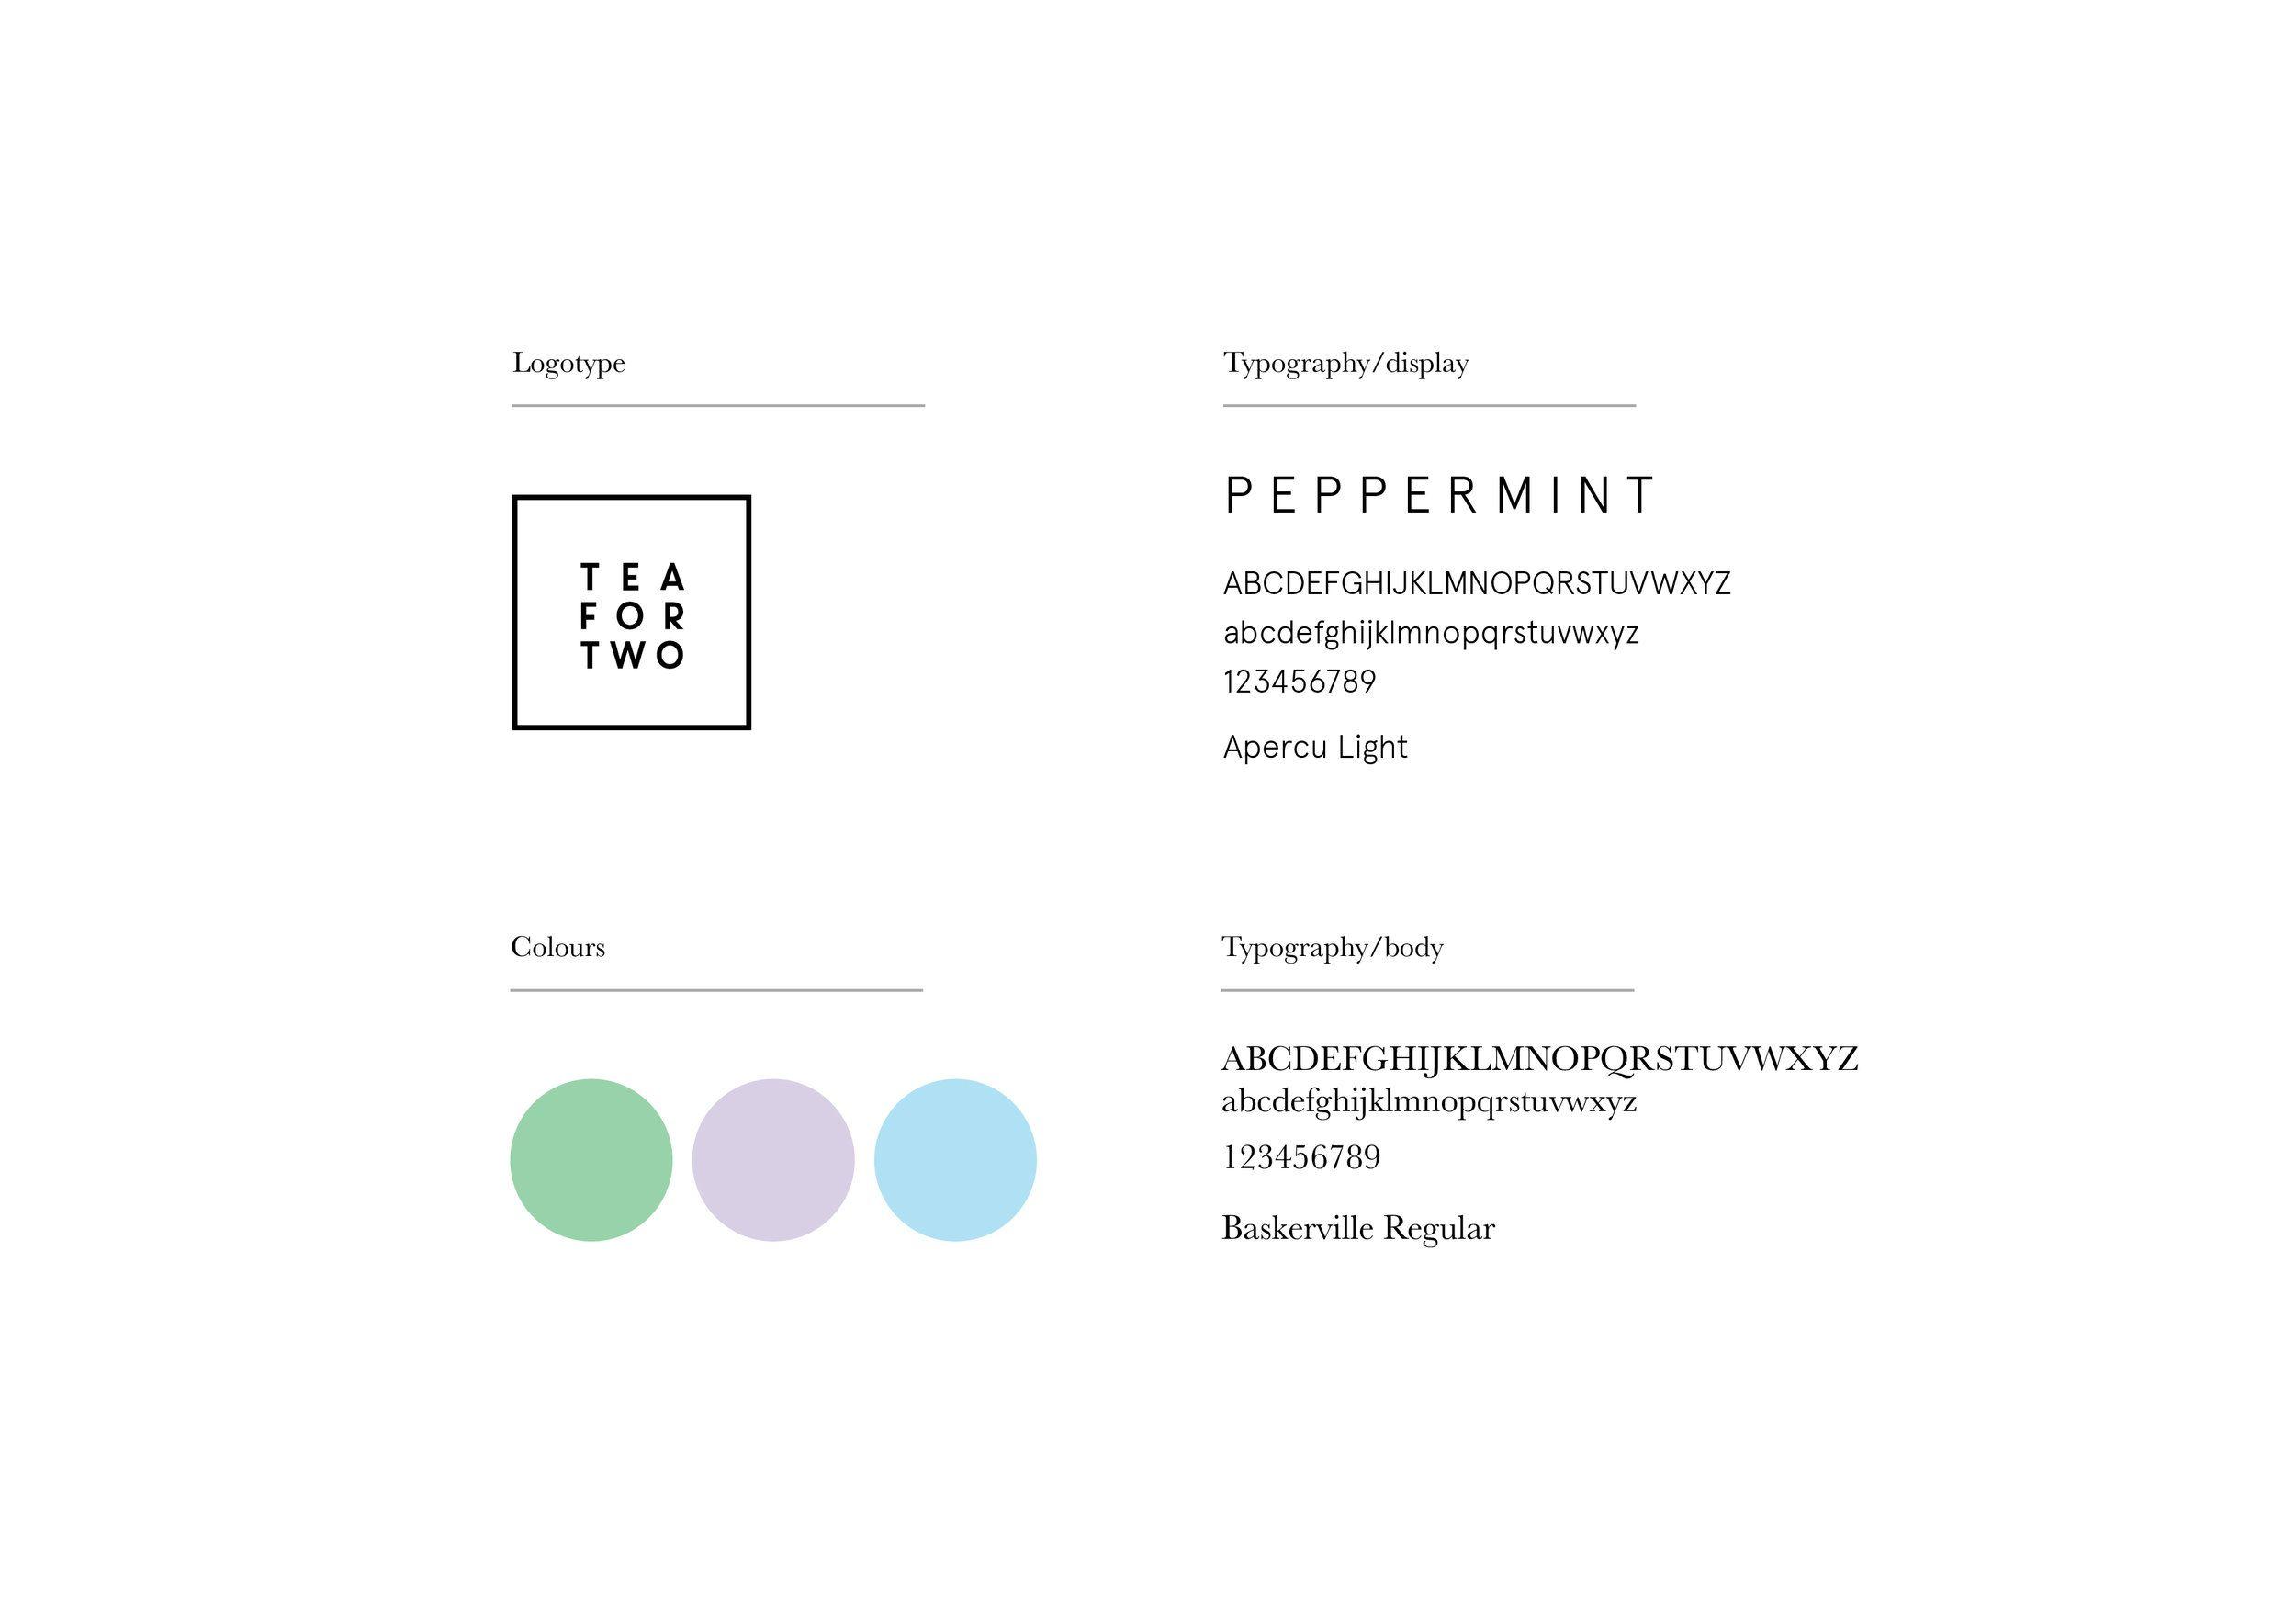 Tea_for_two_design_elements.jpg